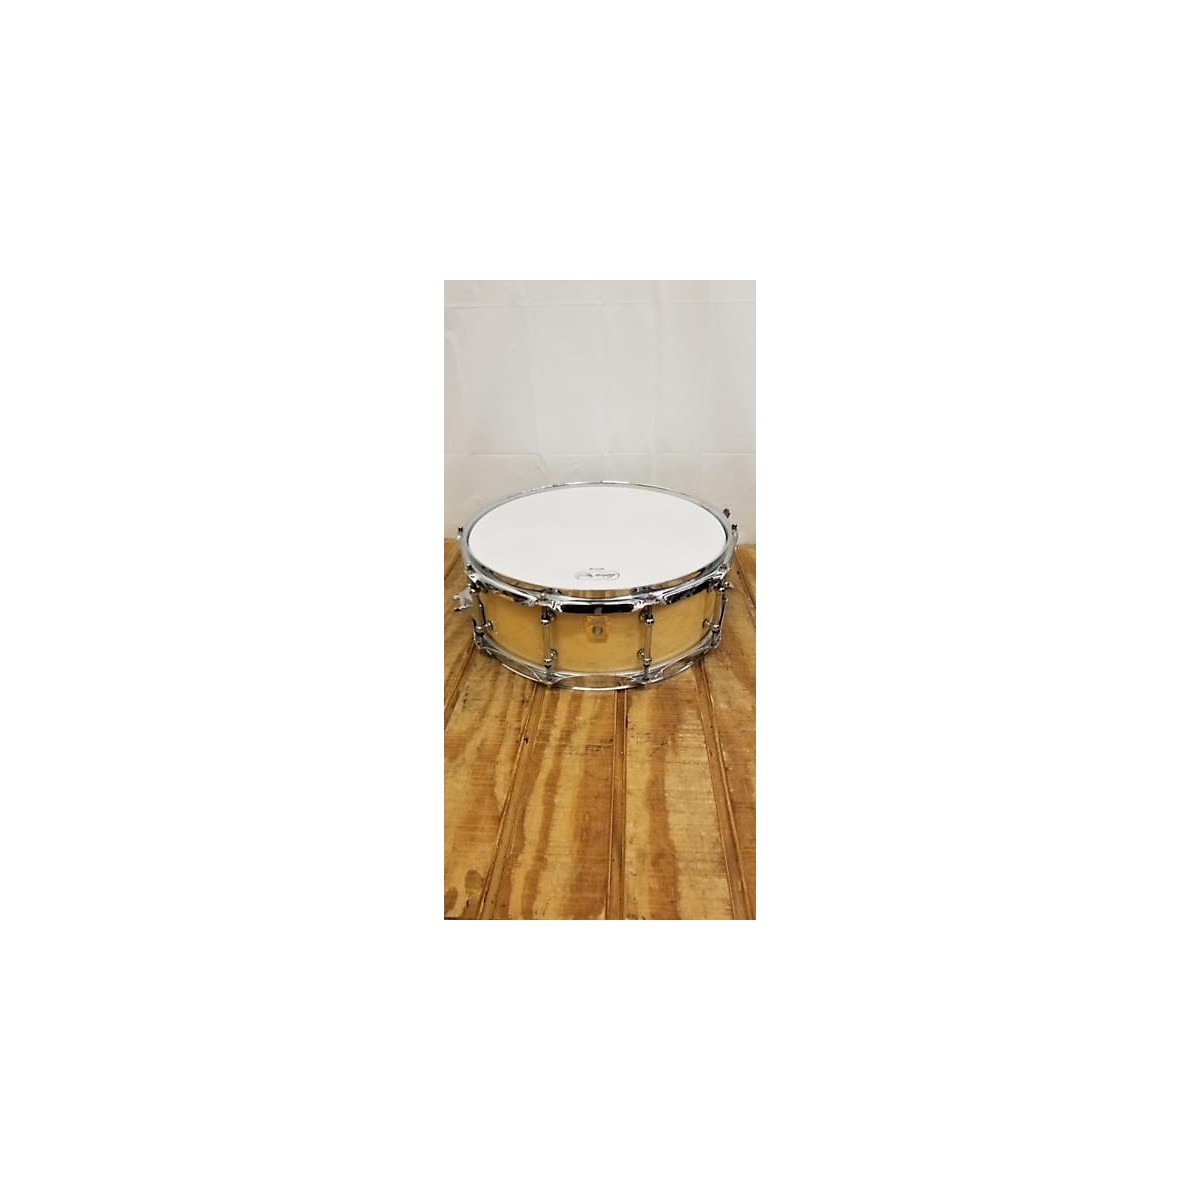 Ludwig 5X14 Ls401 Drum